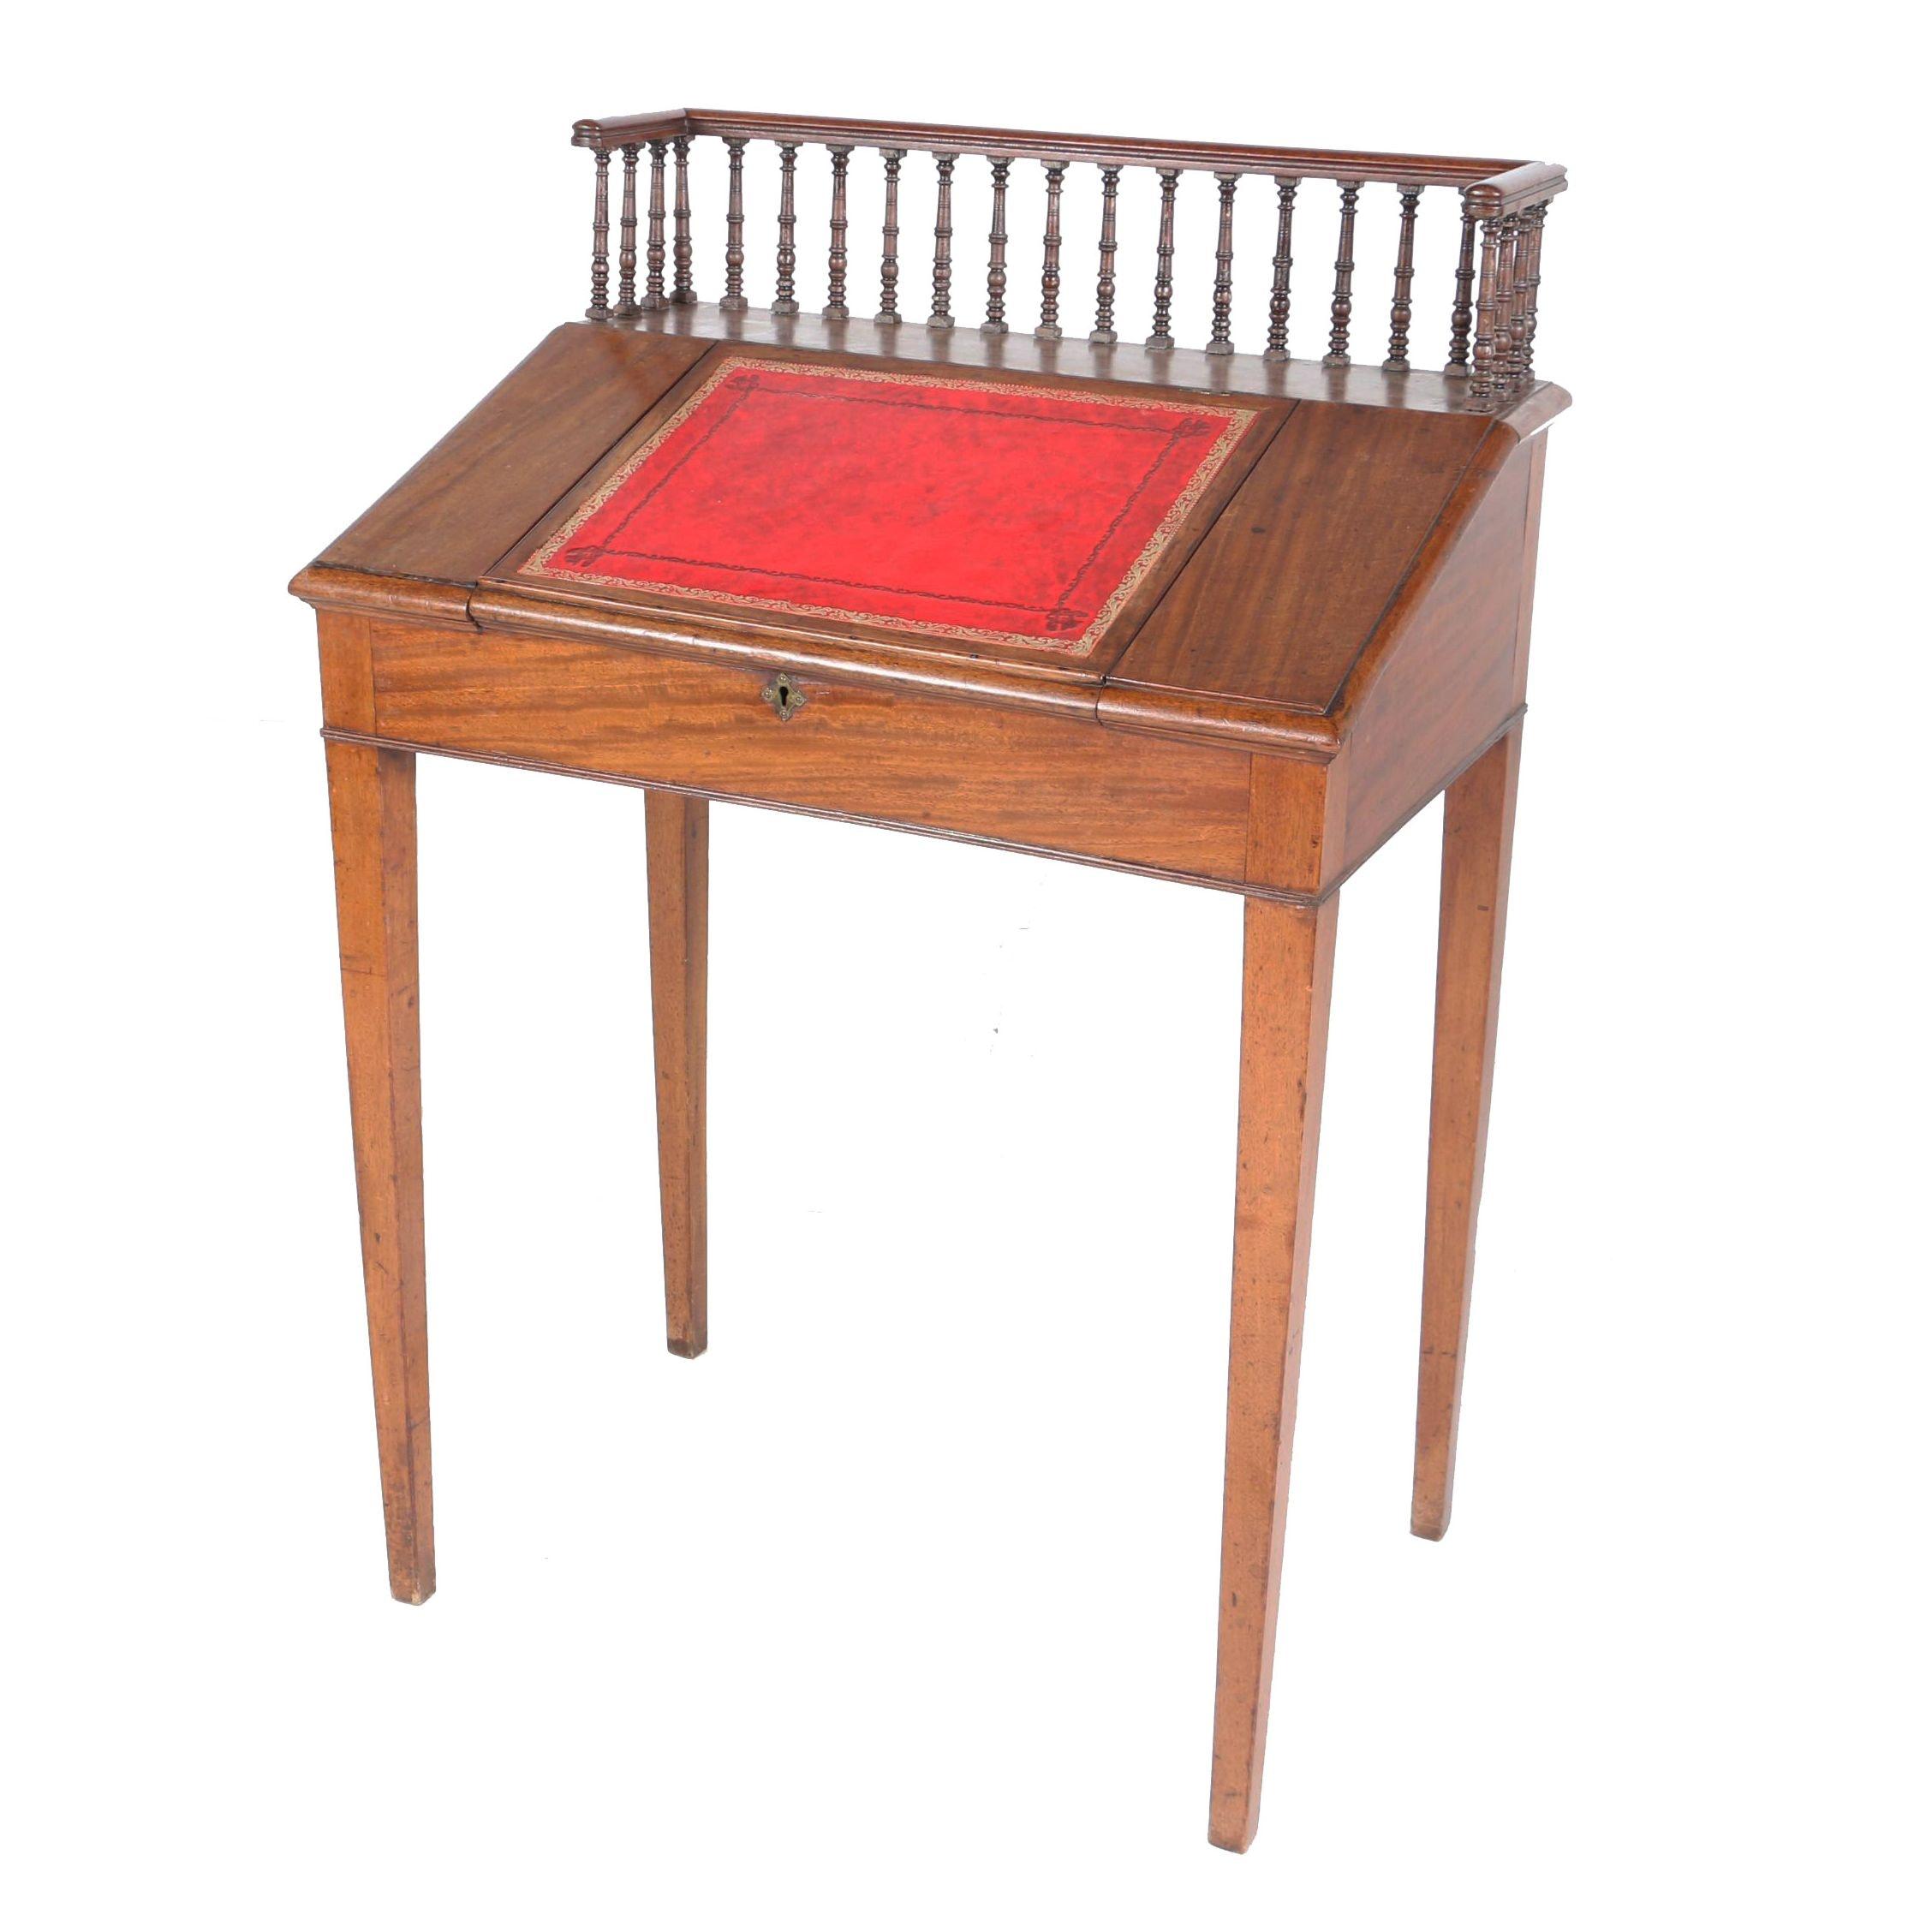 Victorian Mahogany Slant-Front Desk, Mid/Late 19th Century